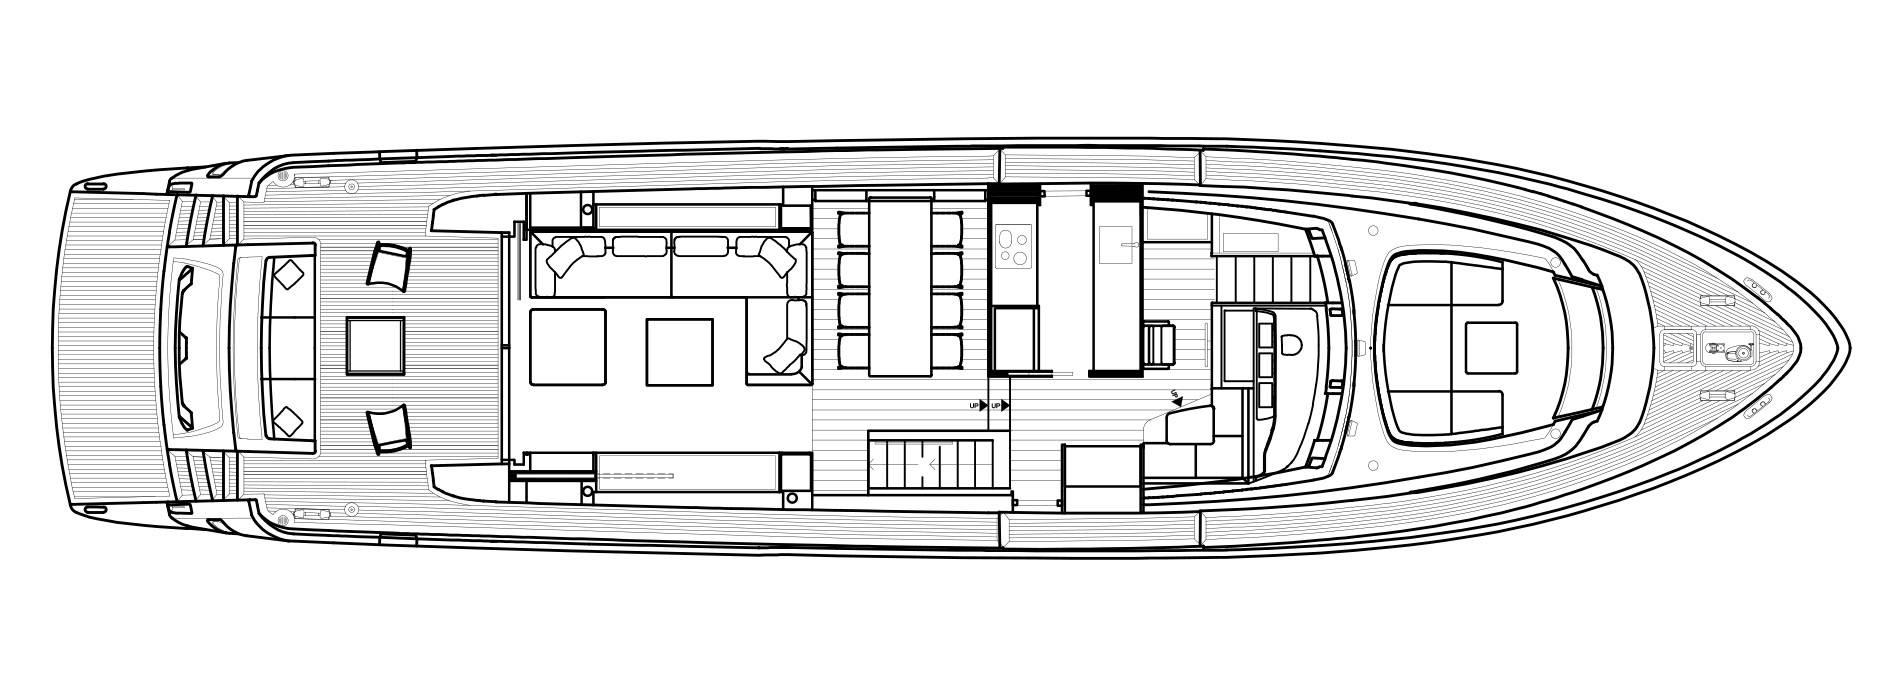 Sanlorenzo Yachts SL78 Main Deck